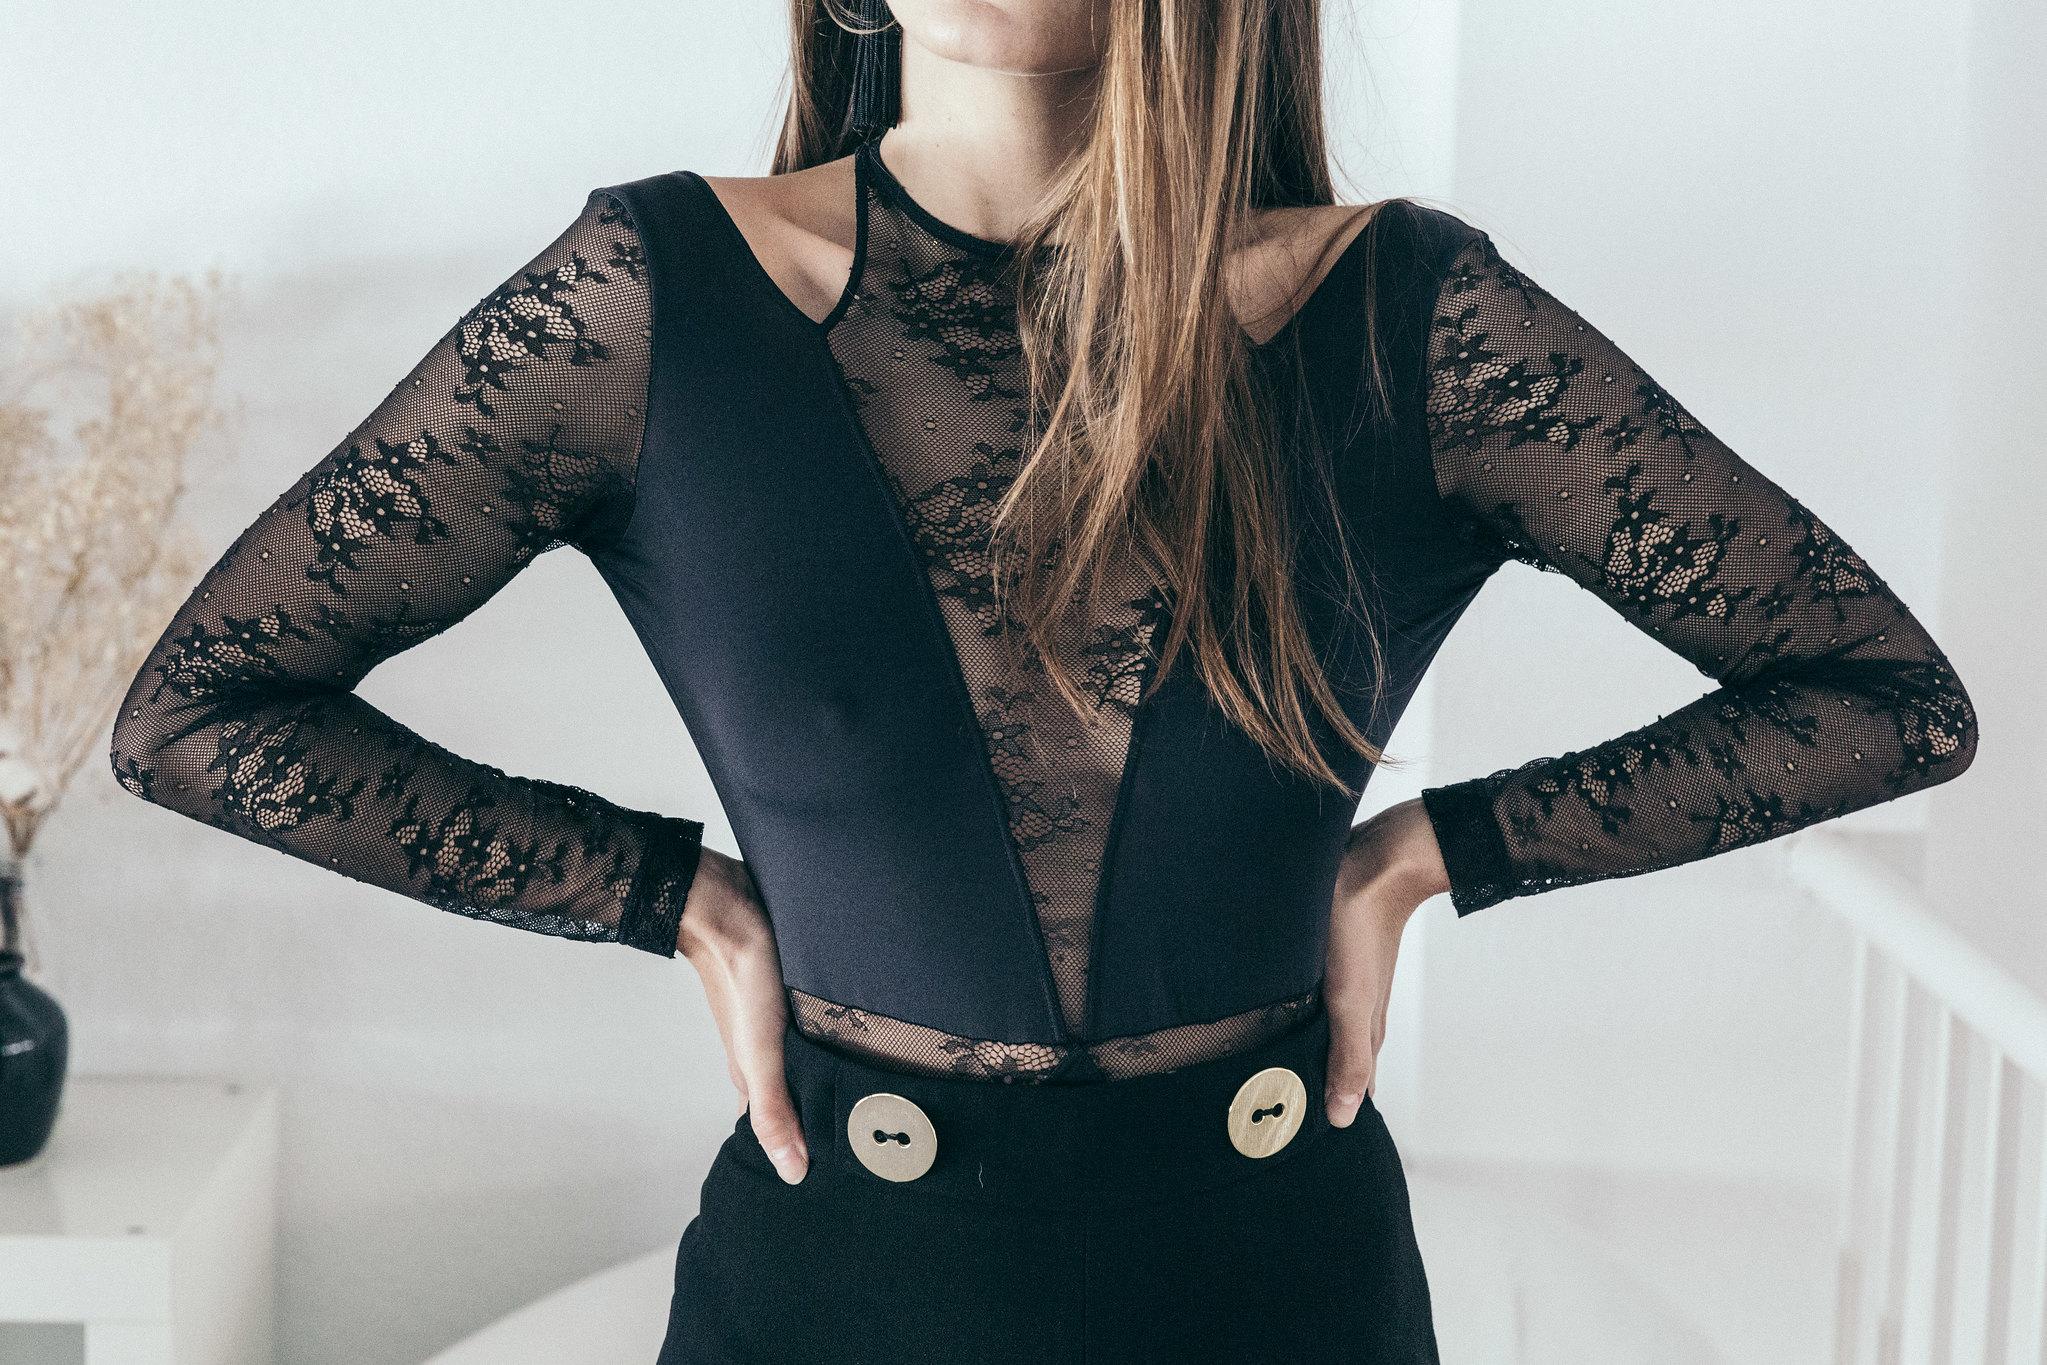 Jessie Chanes - Seams for a desire - WS - Women'secret -19